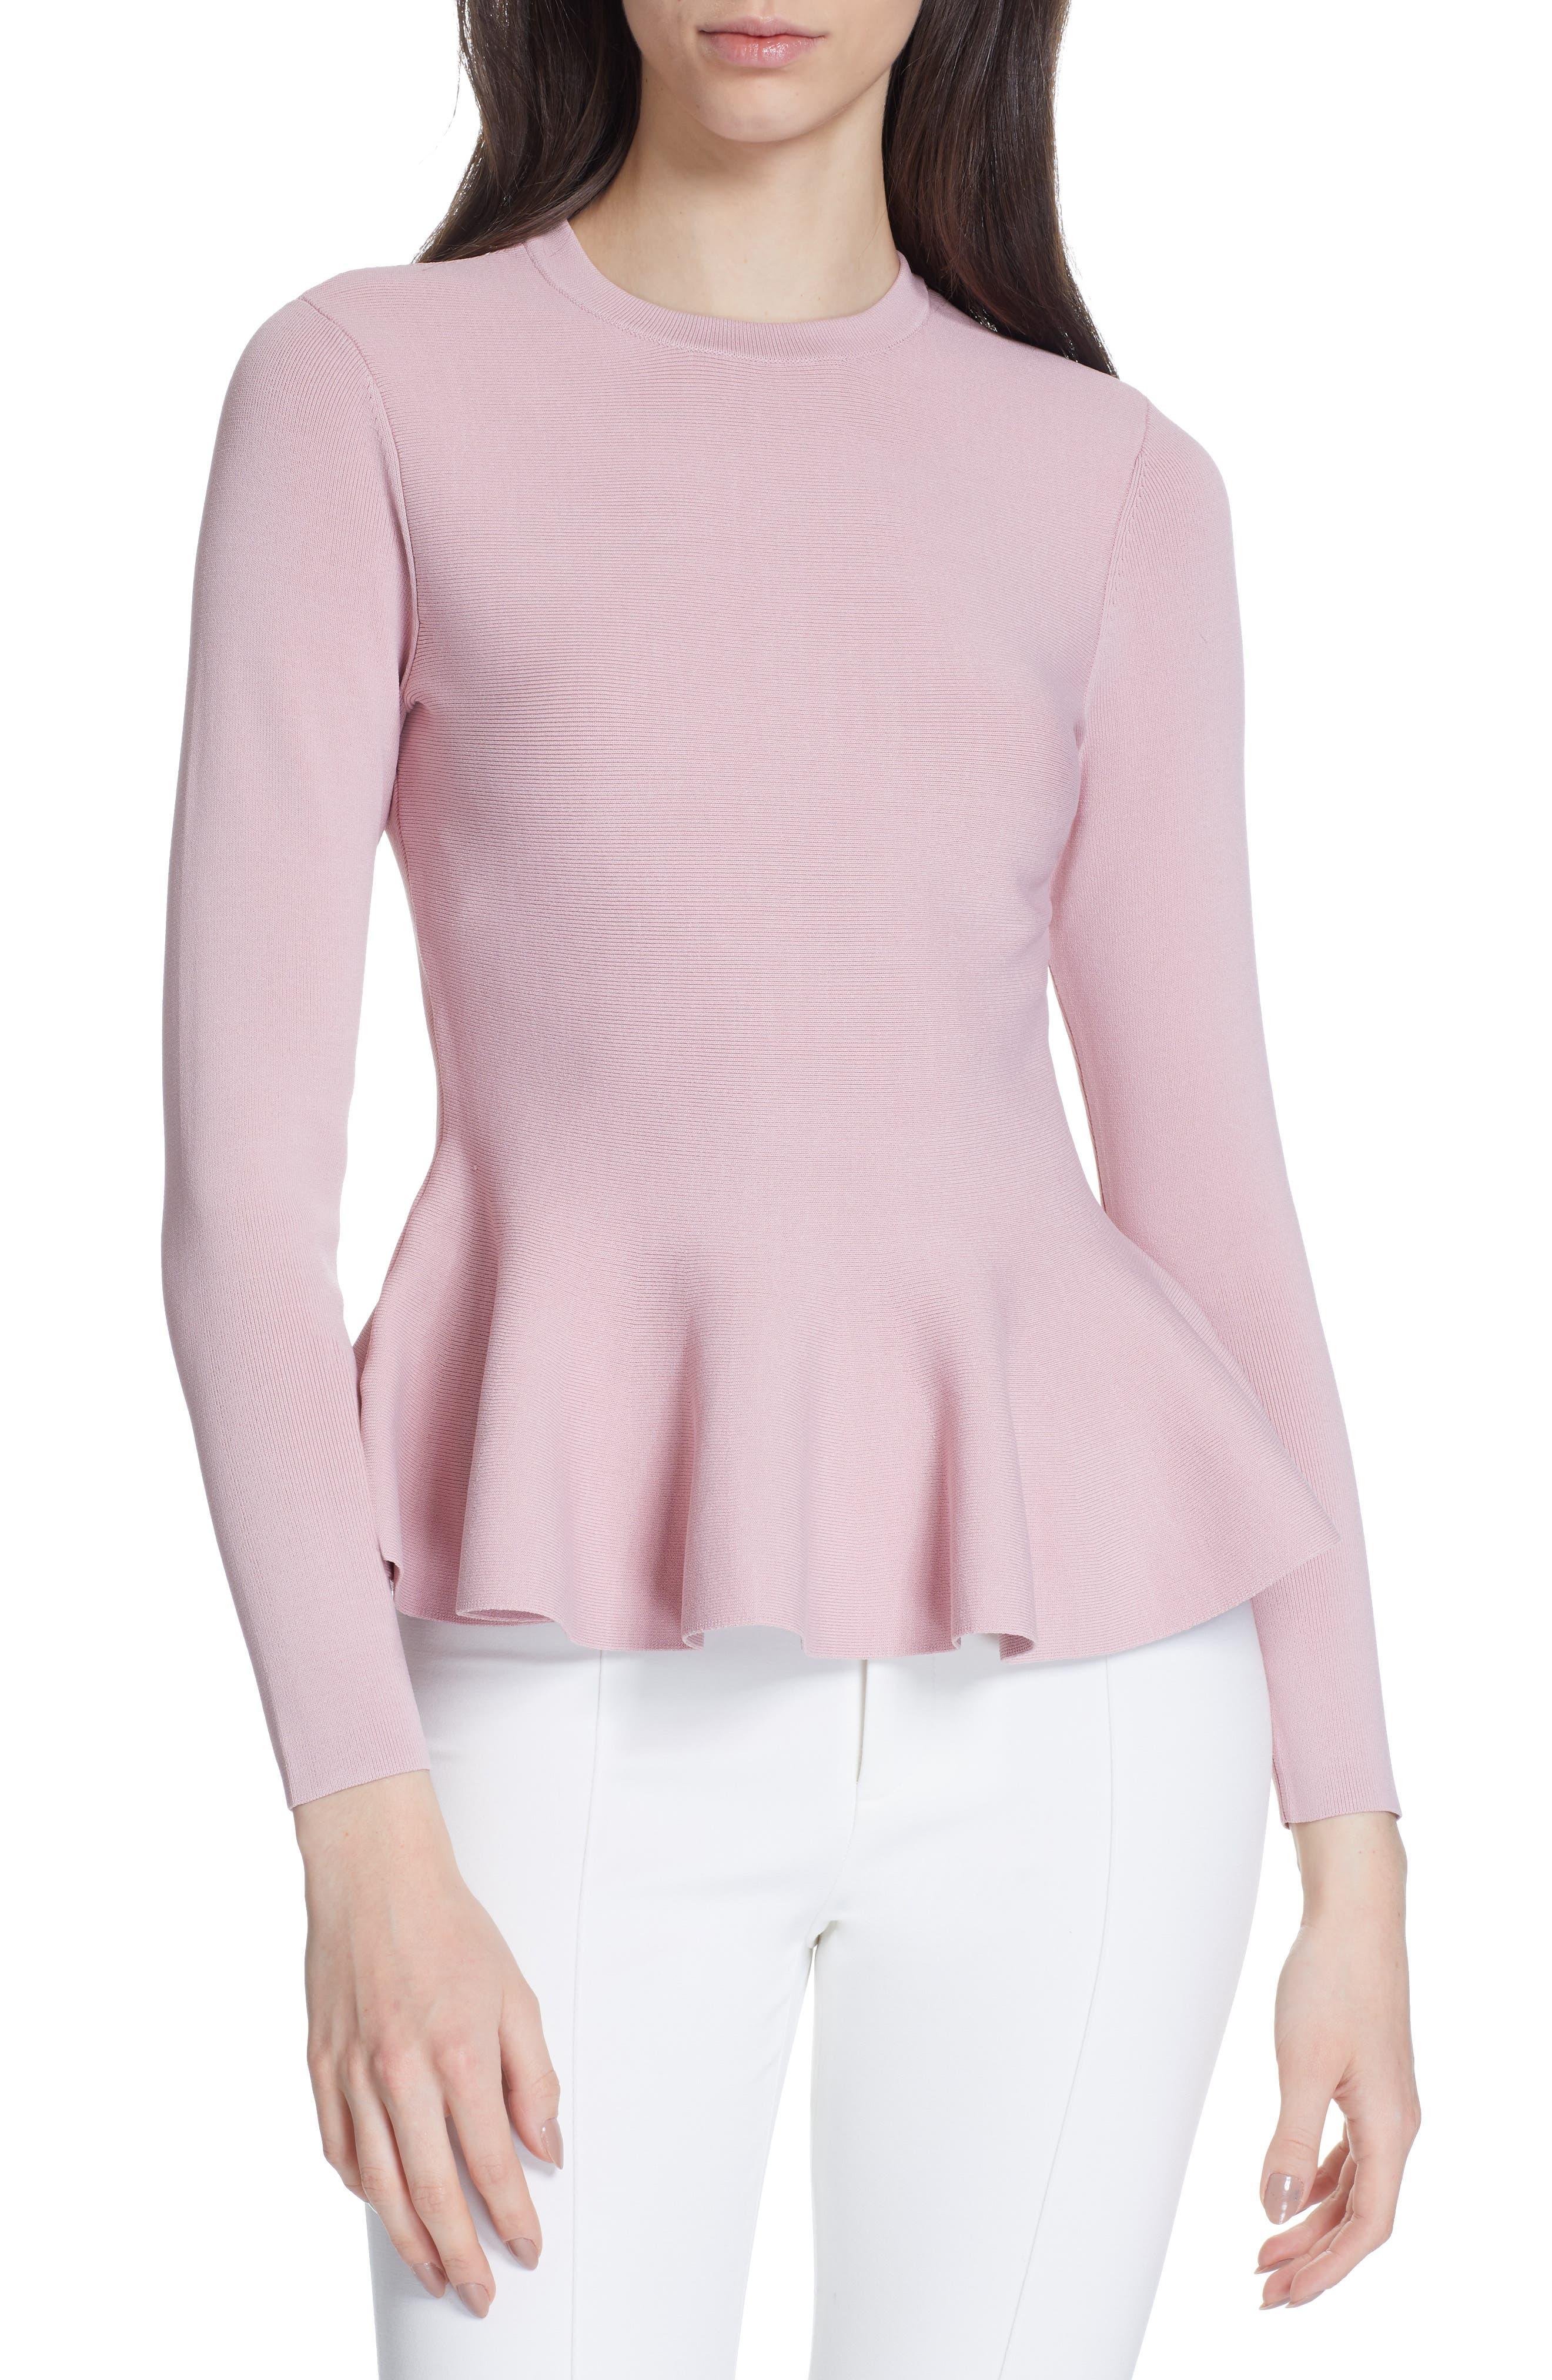 Hinlia Peplum Sweater,                             Main thumbnail 1, color,                             DUSKY PINK